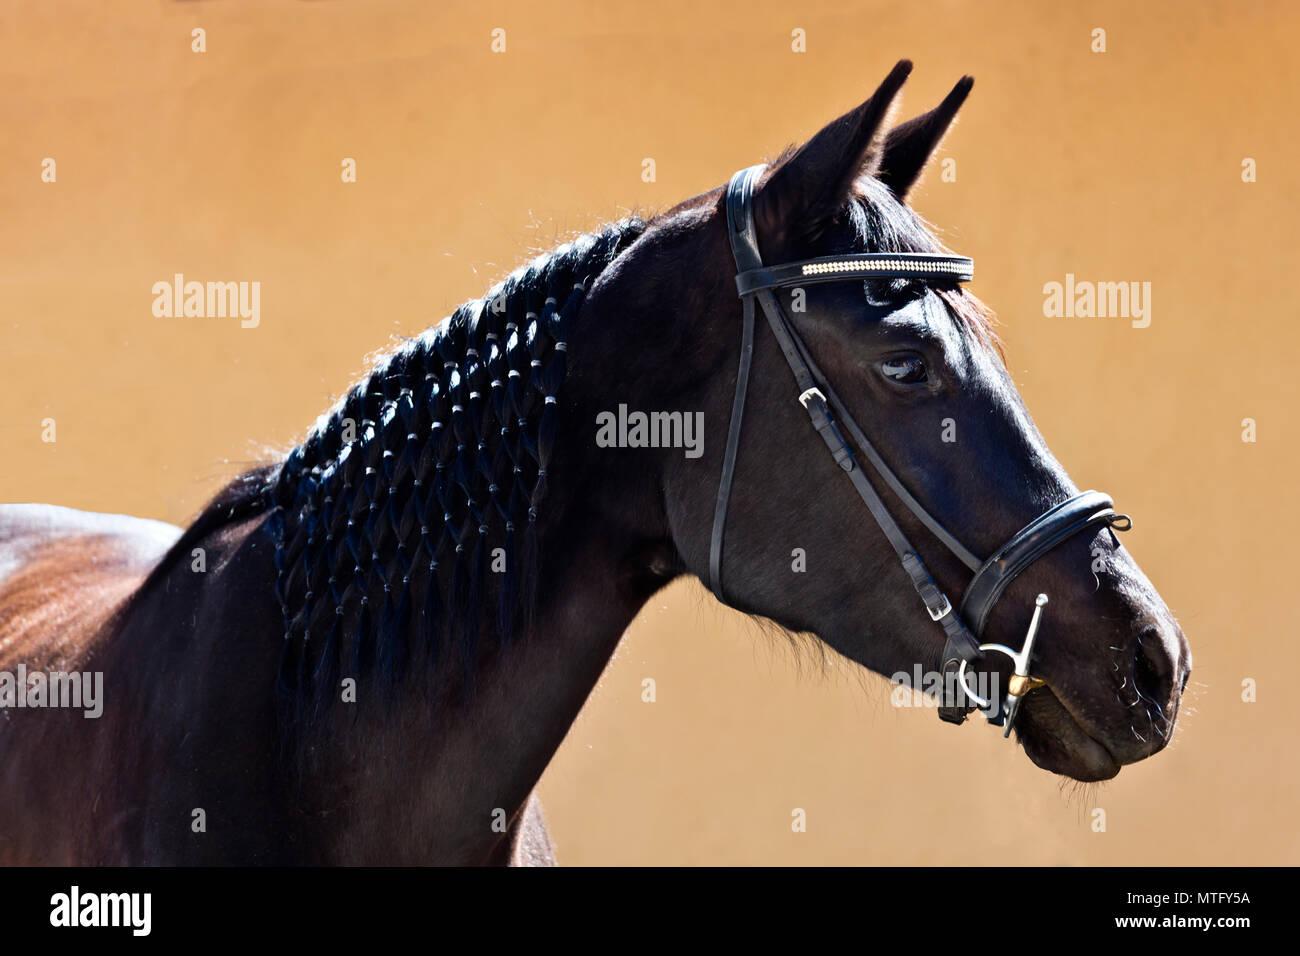 A pure bred LUSITANO horse at Granitas de Animas Ranch - SAN MIGUEL DE ALLENDE, MEXICO - Stock Image